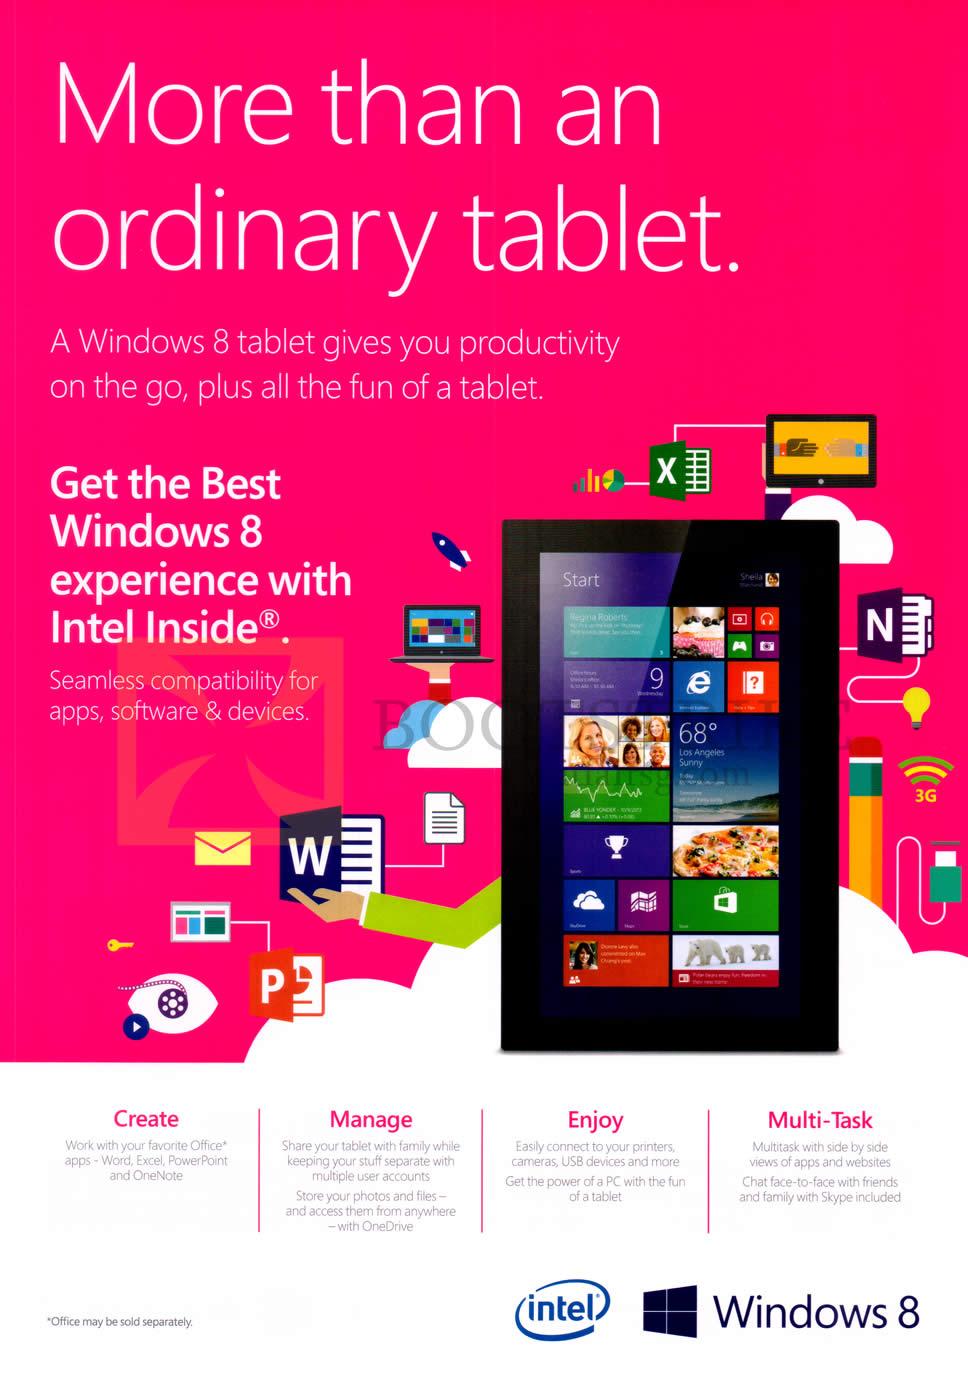 PC SHOW 2014 price list image brochure of Intel Windows 8